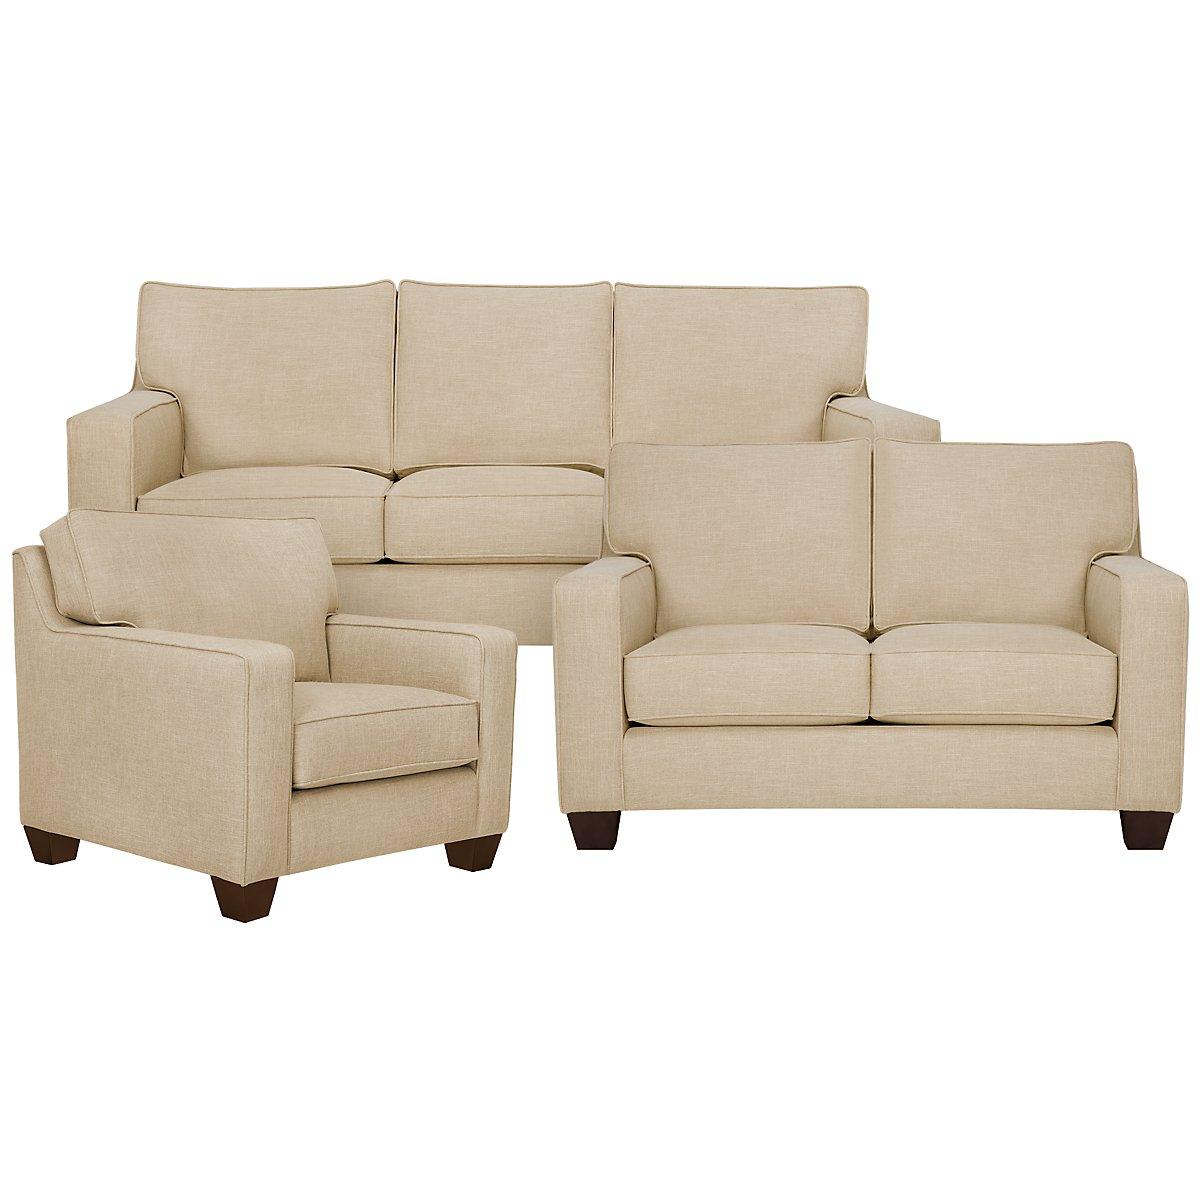 York Beige Fabric Living Room